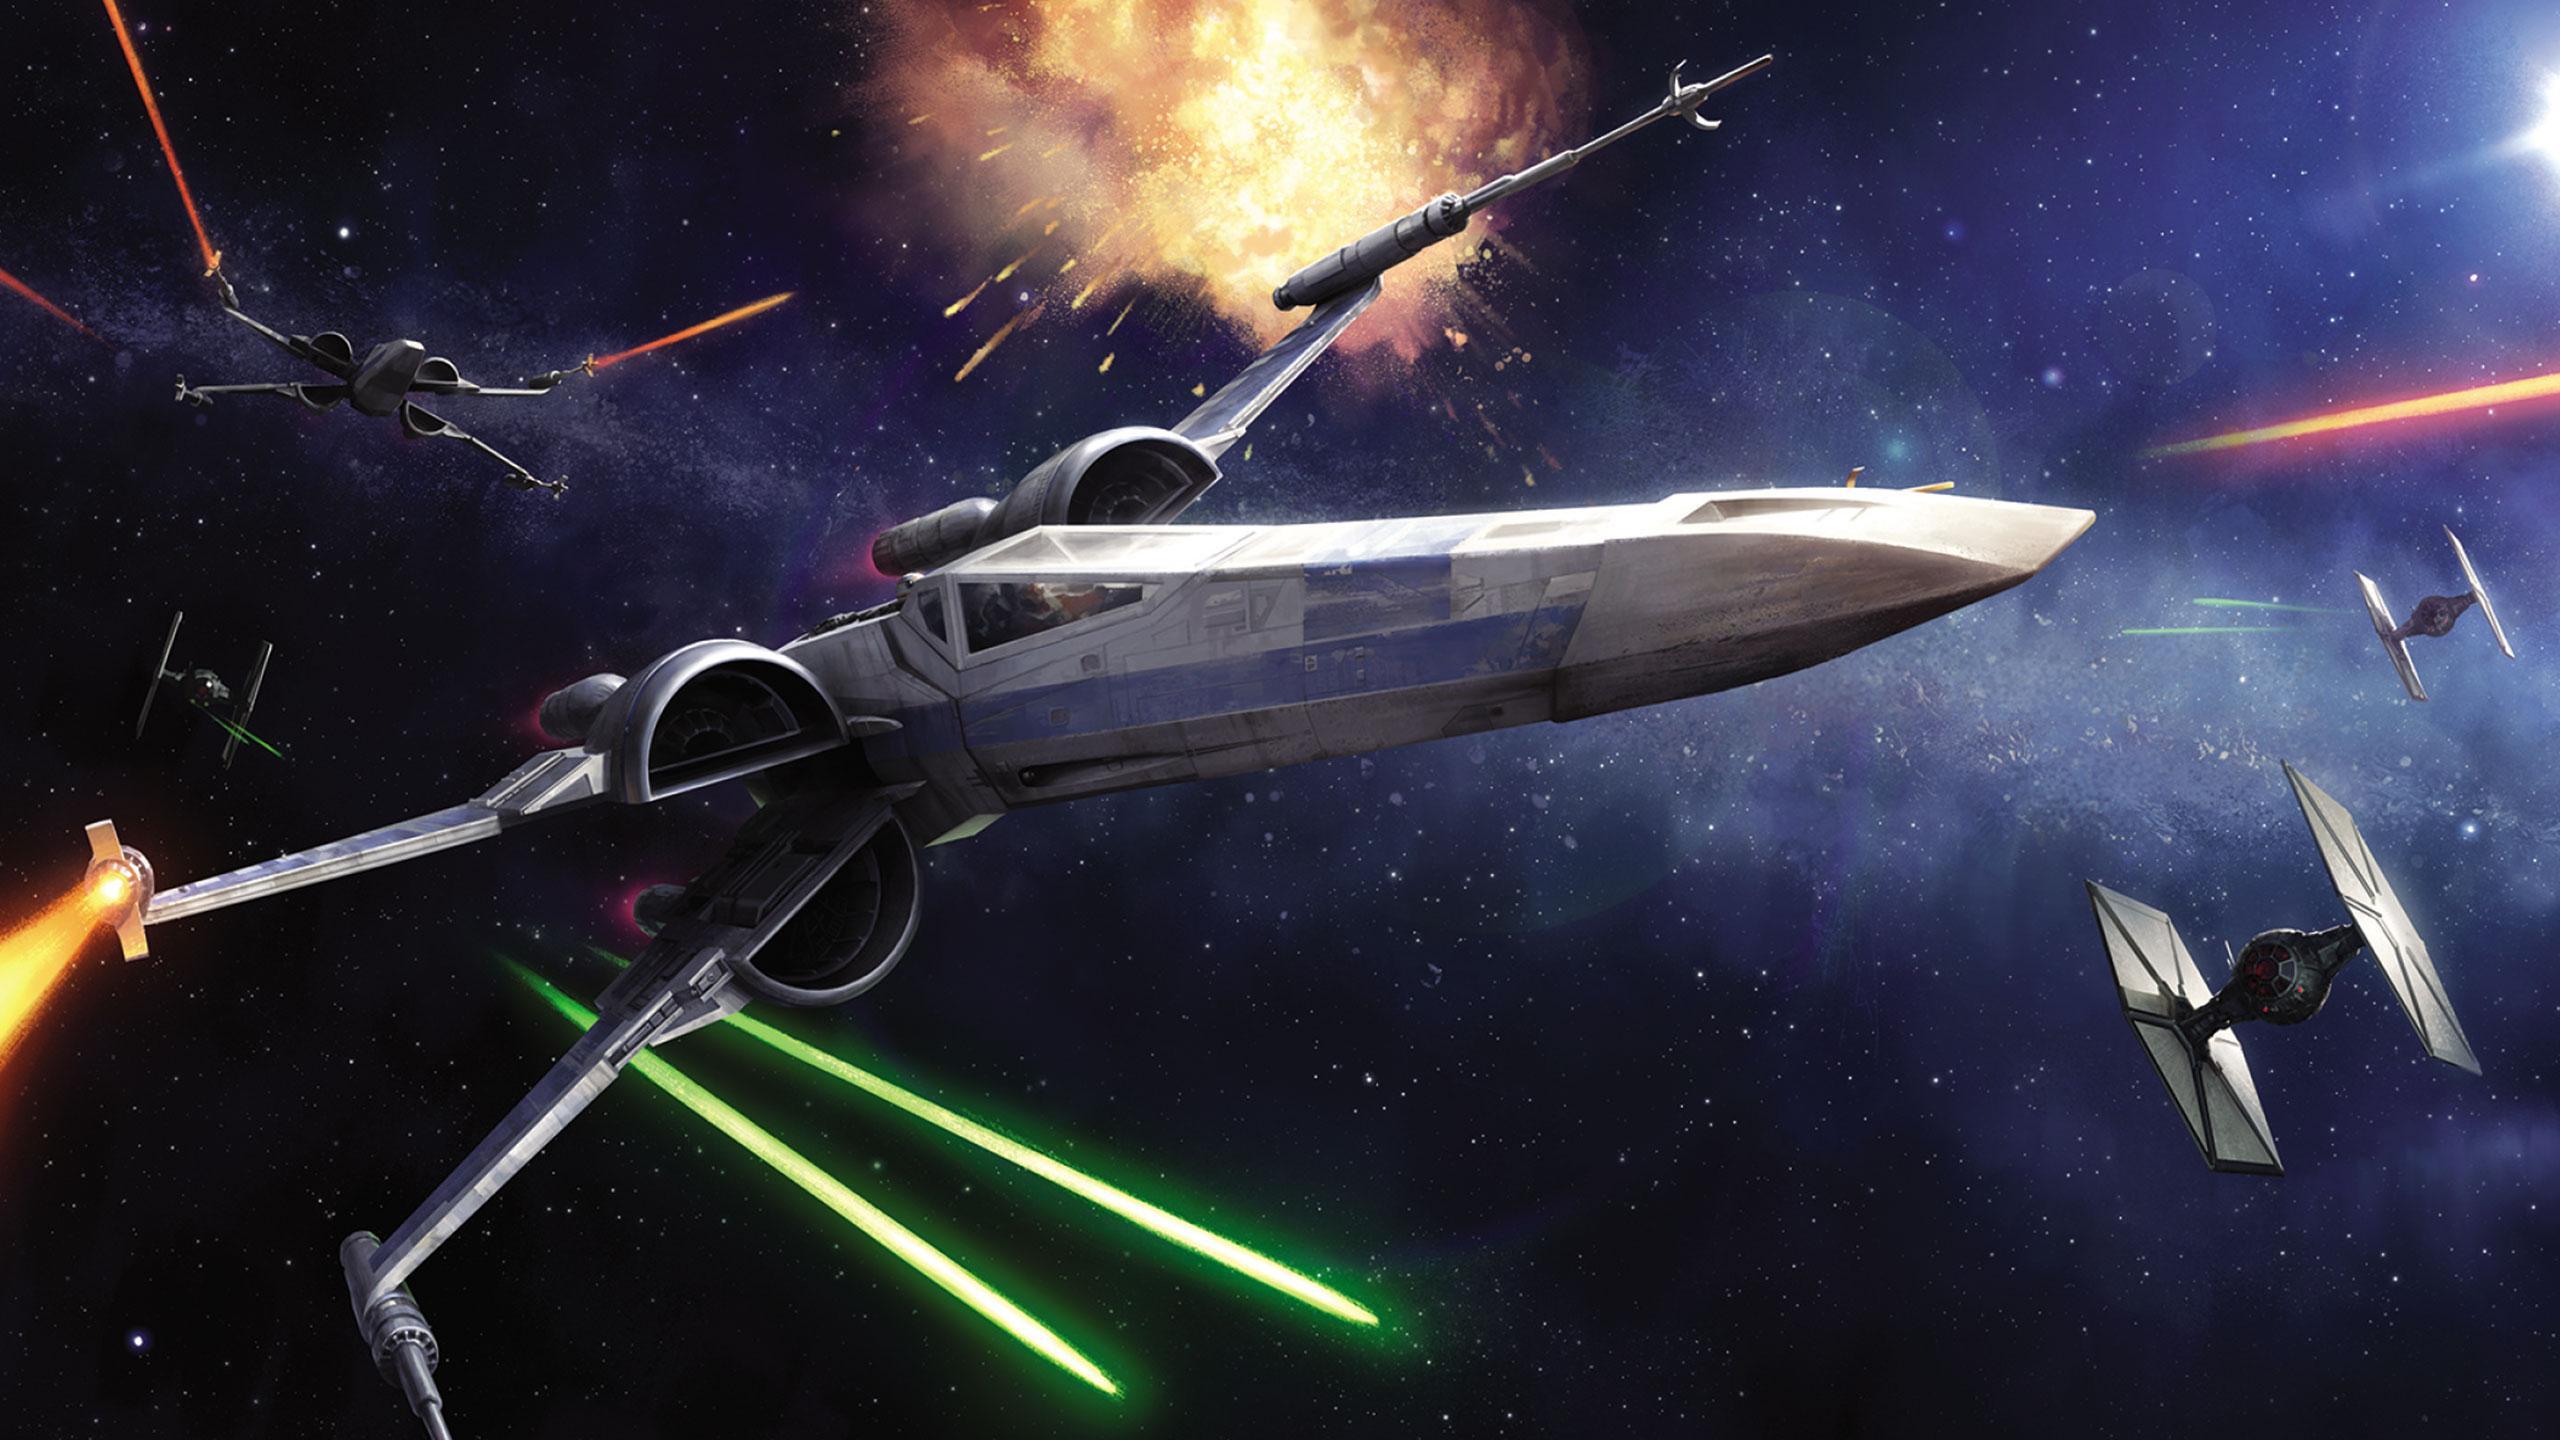 star wars wing logo